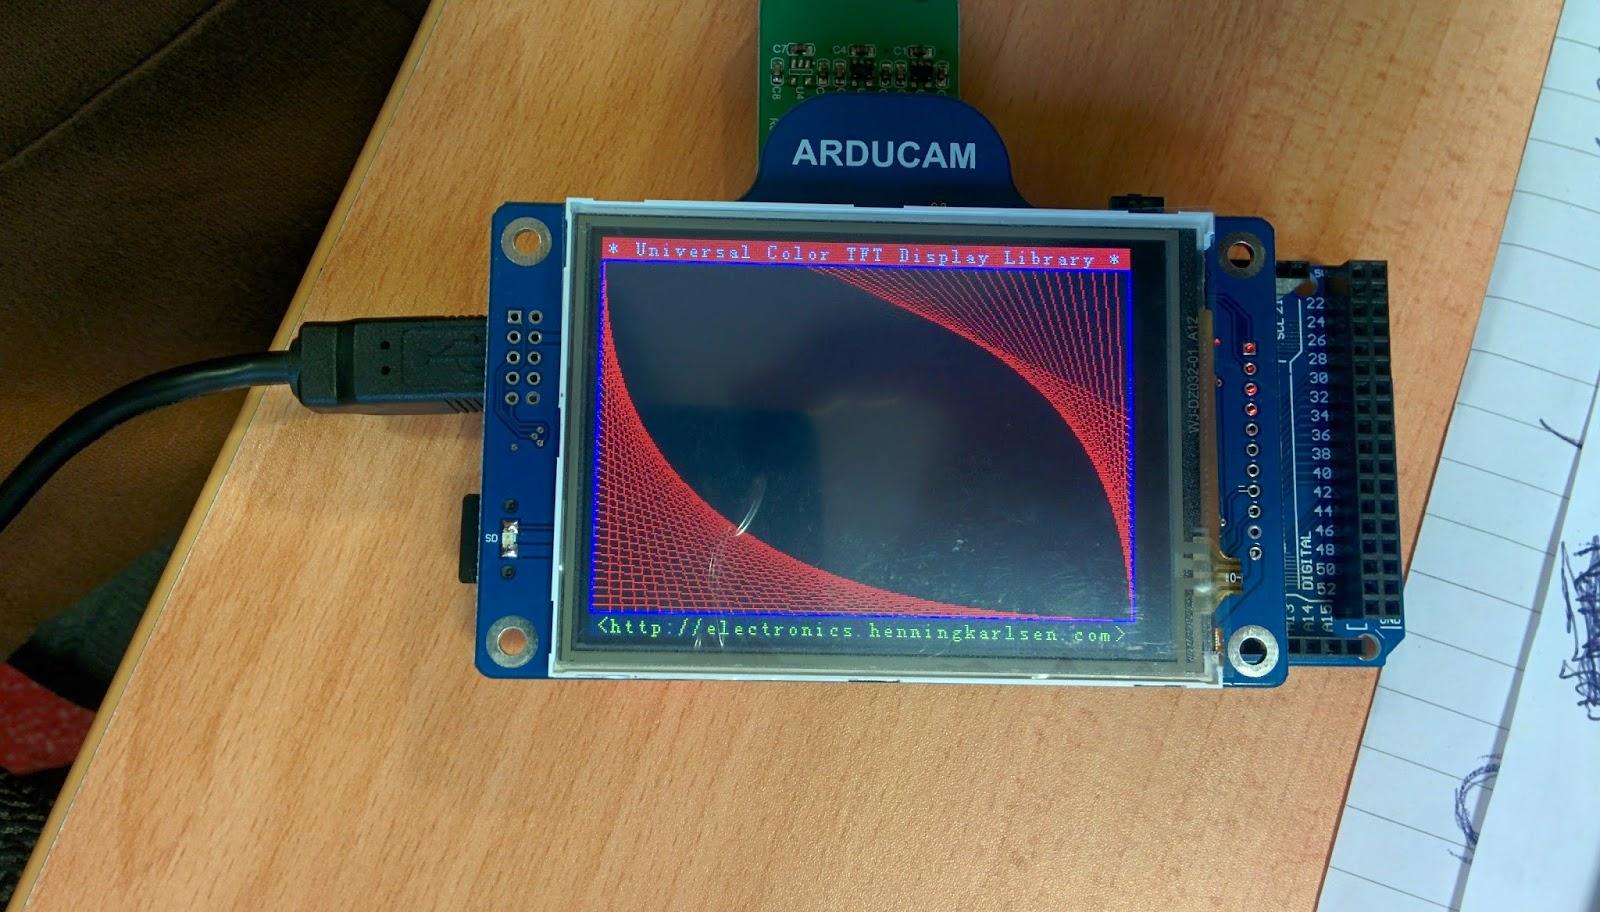 Karl Lankester-Carthy: Arduino MEGA 2560 Board issues